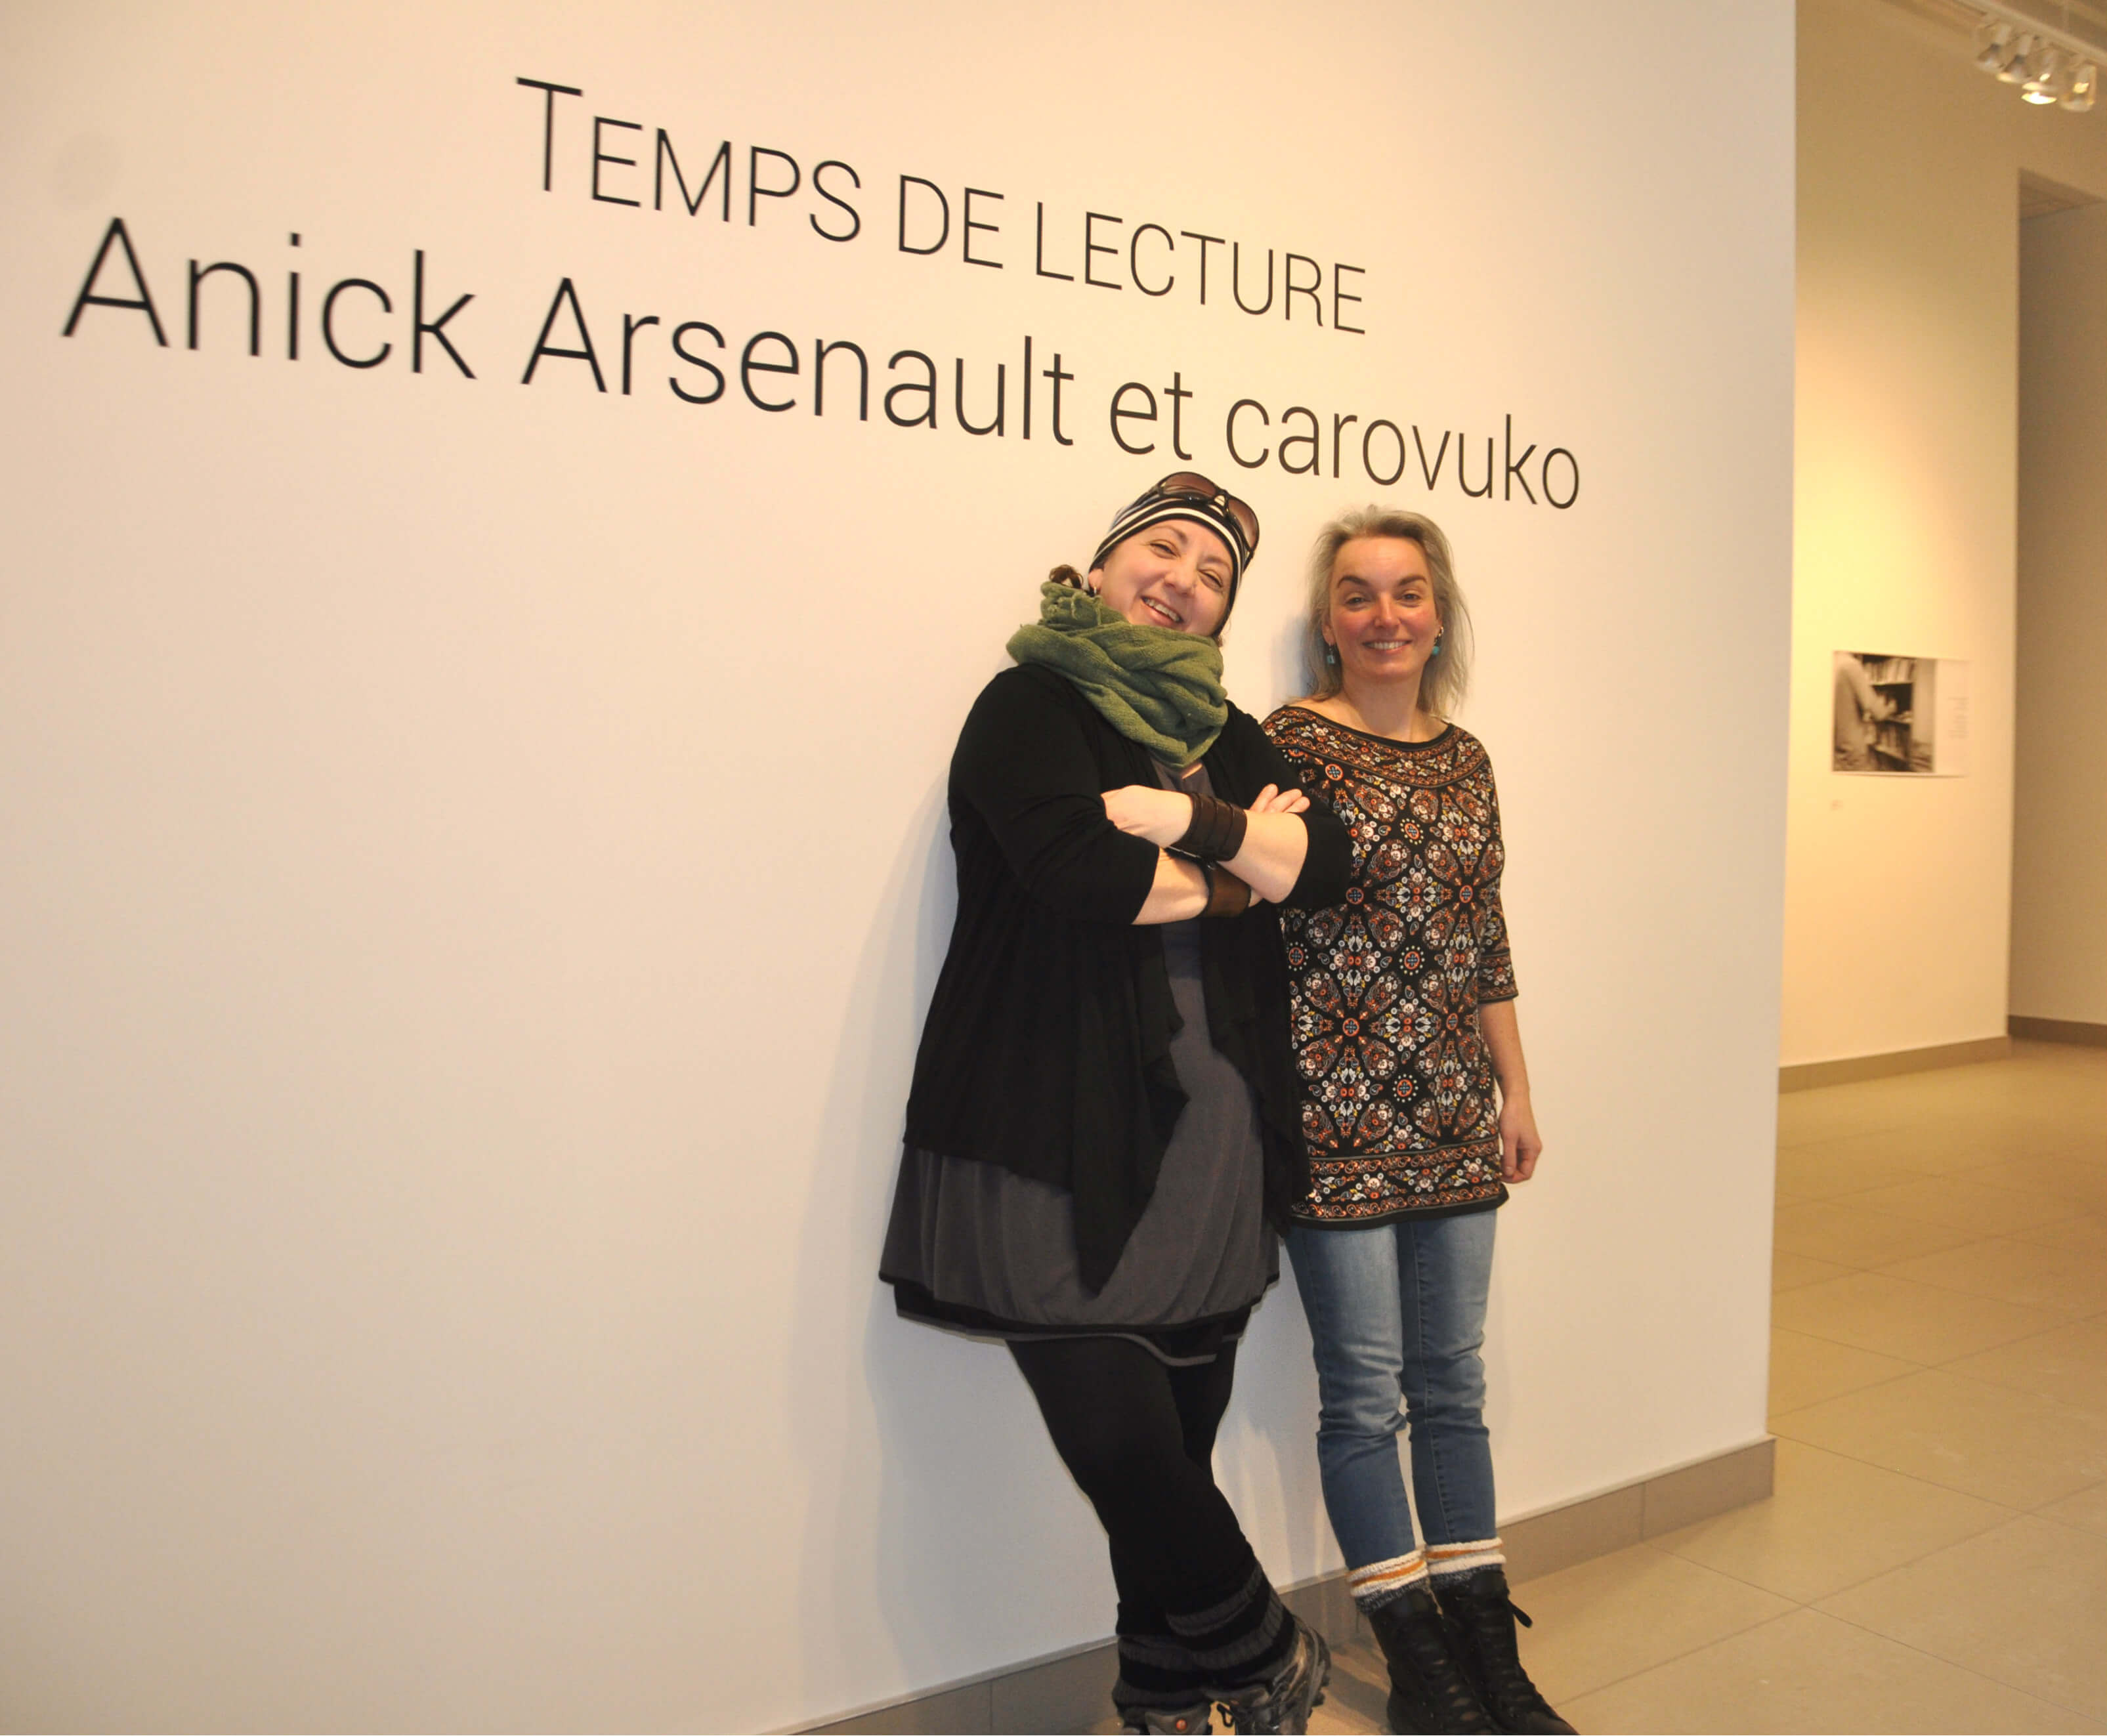 Caroline Vukovik et Annick Arsenault